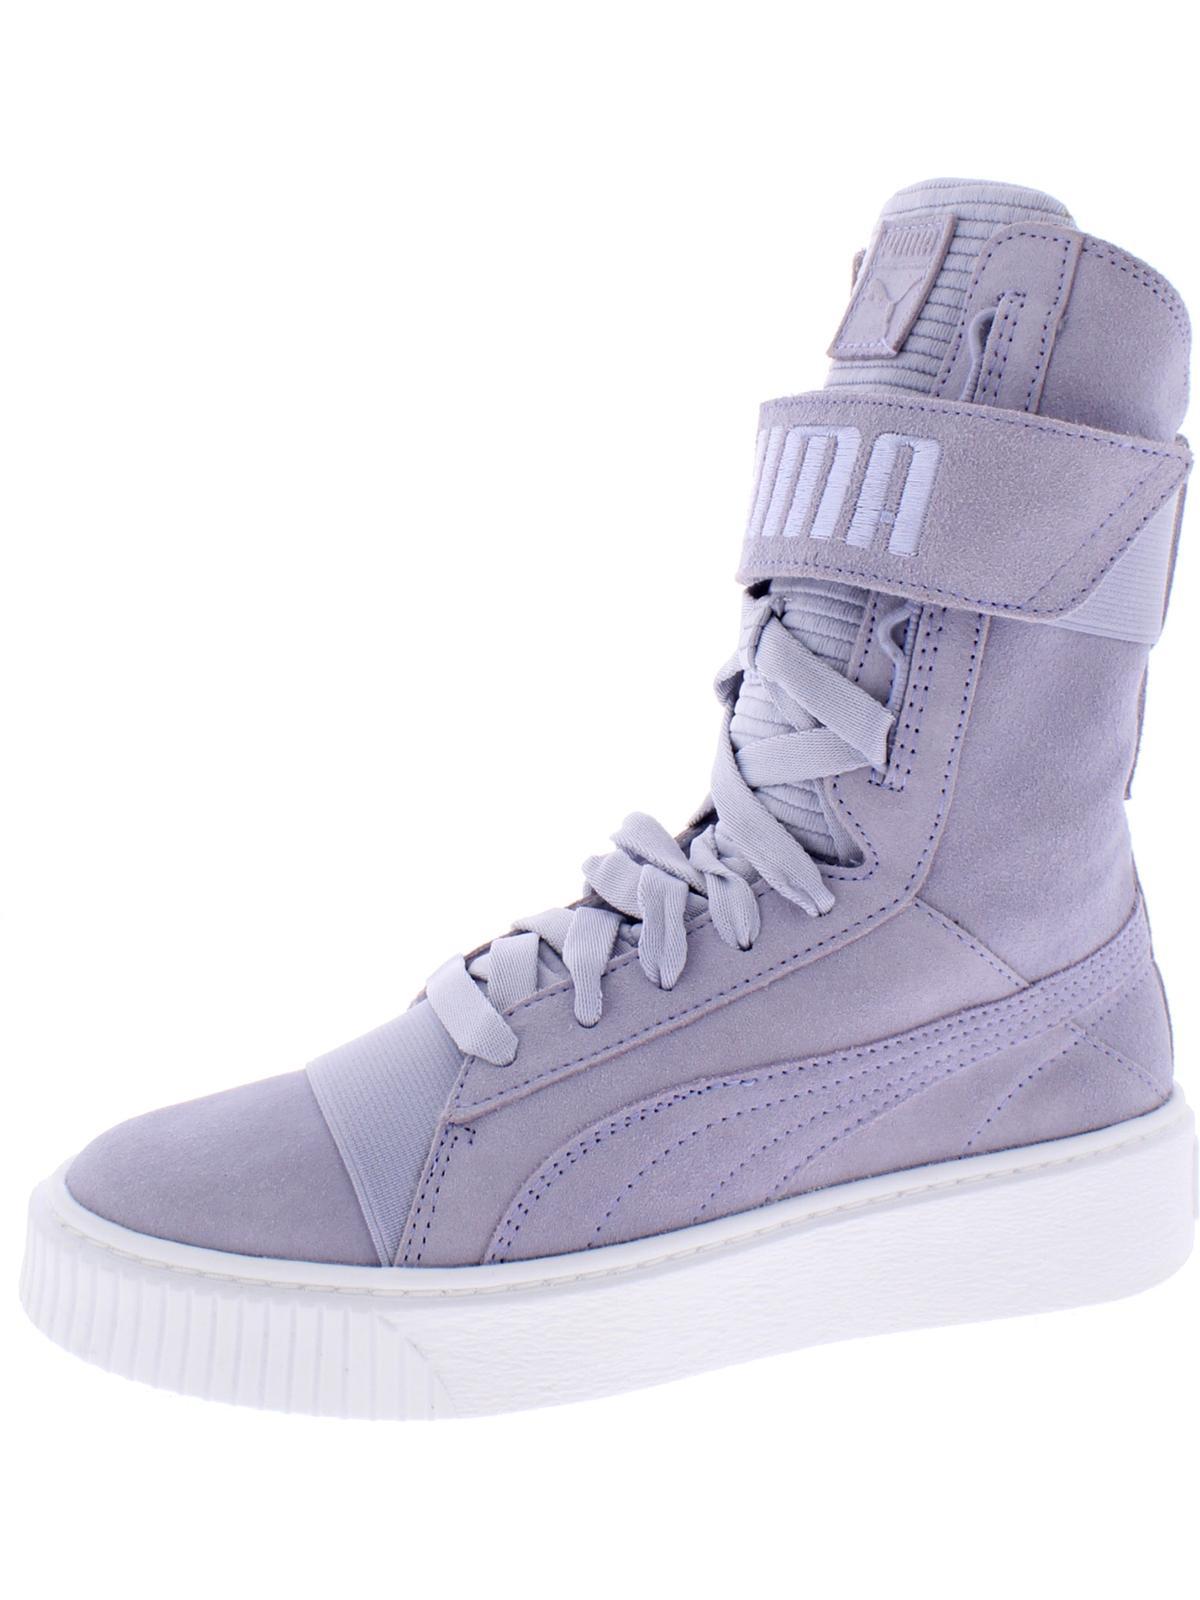 PUMA - Puma Womens Platform Boot Quil High Top Platform Sneakers ...